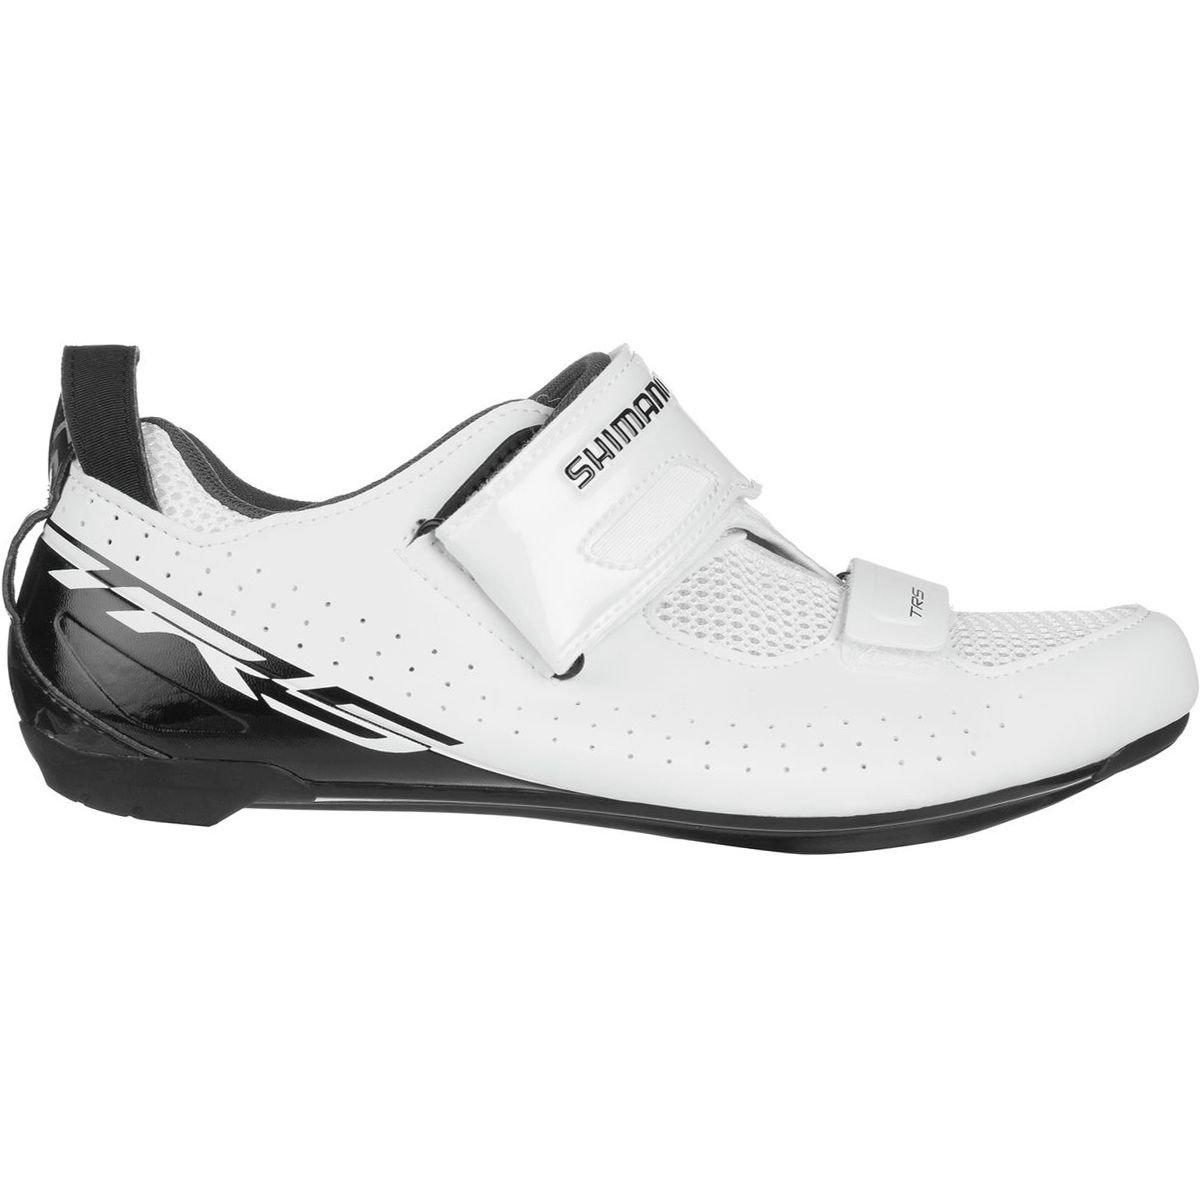 SHIMANO SH-TR5 Cycling Shoe - Men's White; 43 ESHTR5OC430SW00